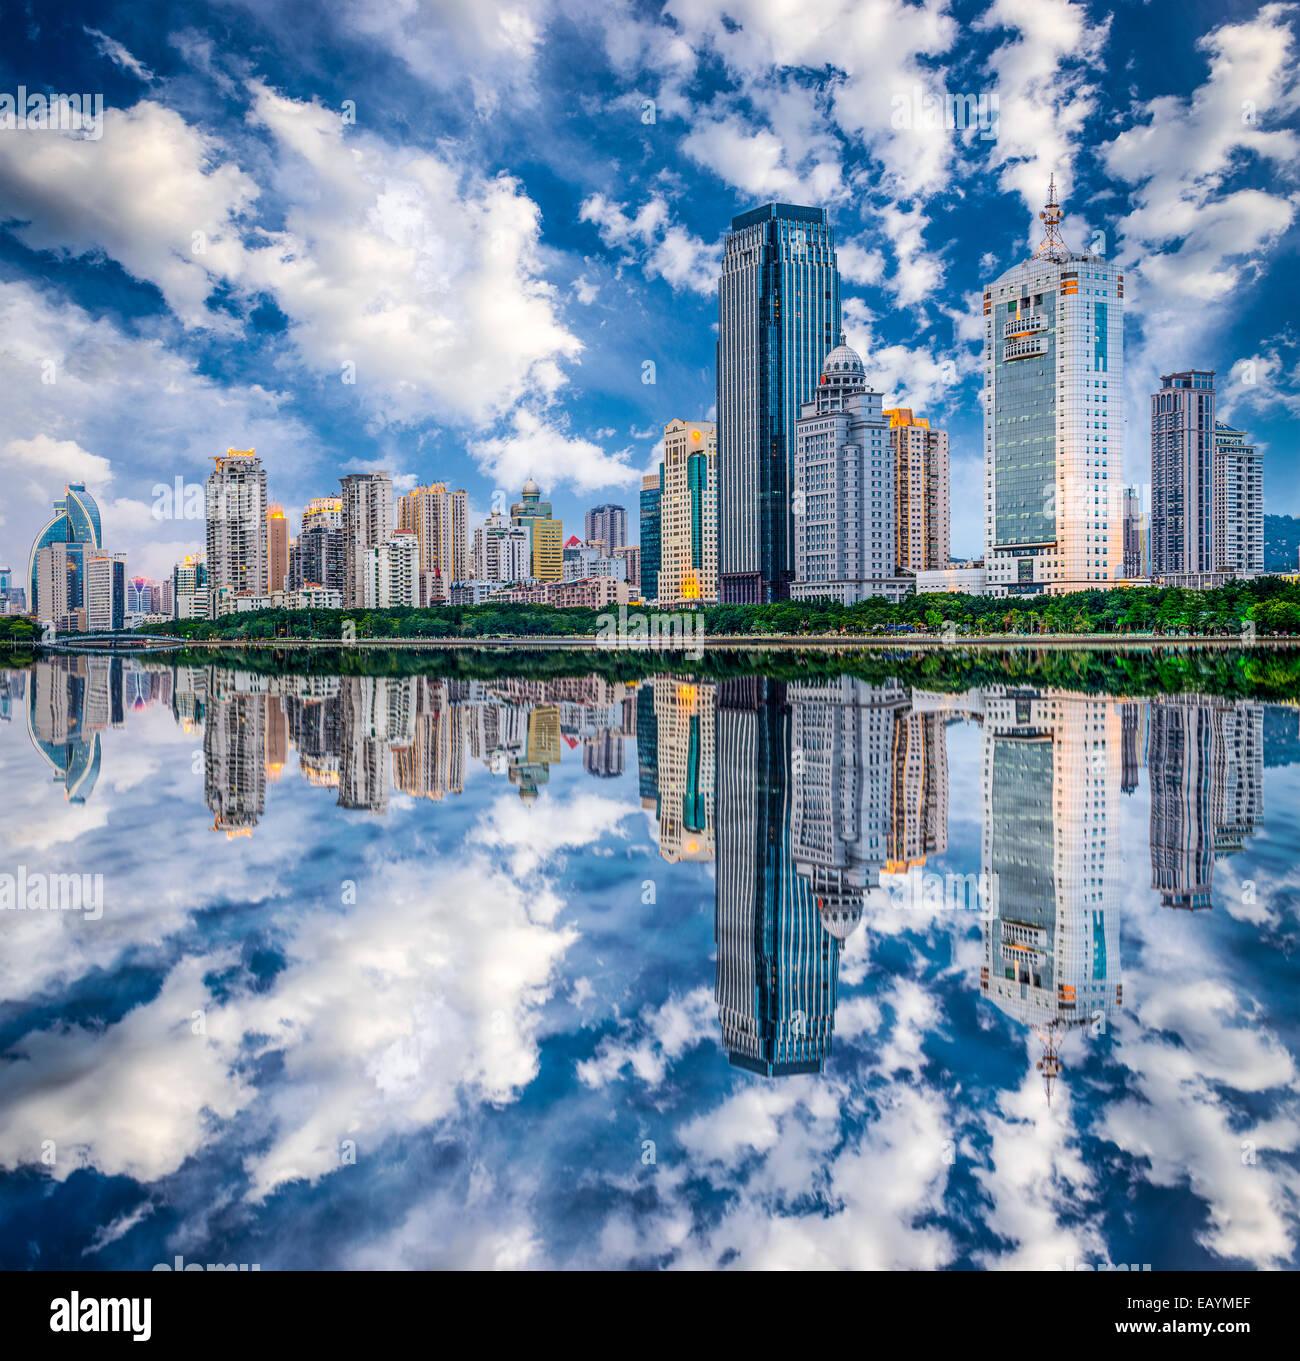 Xiamen, China skyline on Yundang Lake. - Stock Image